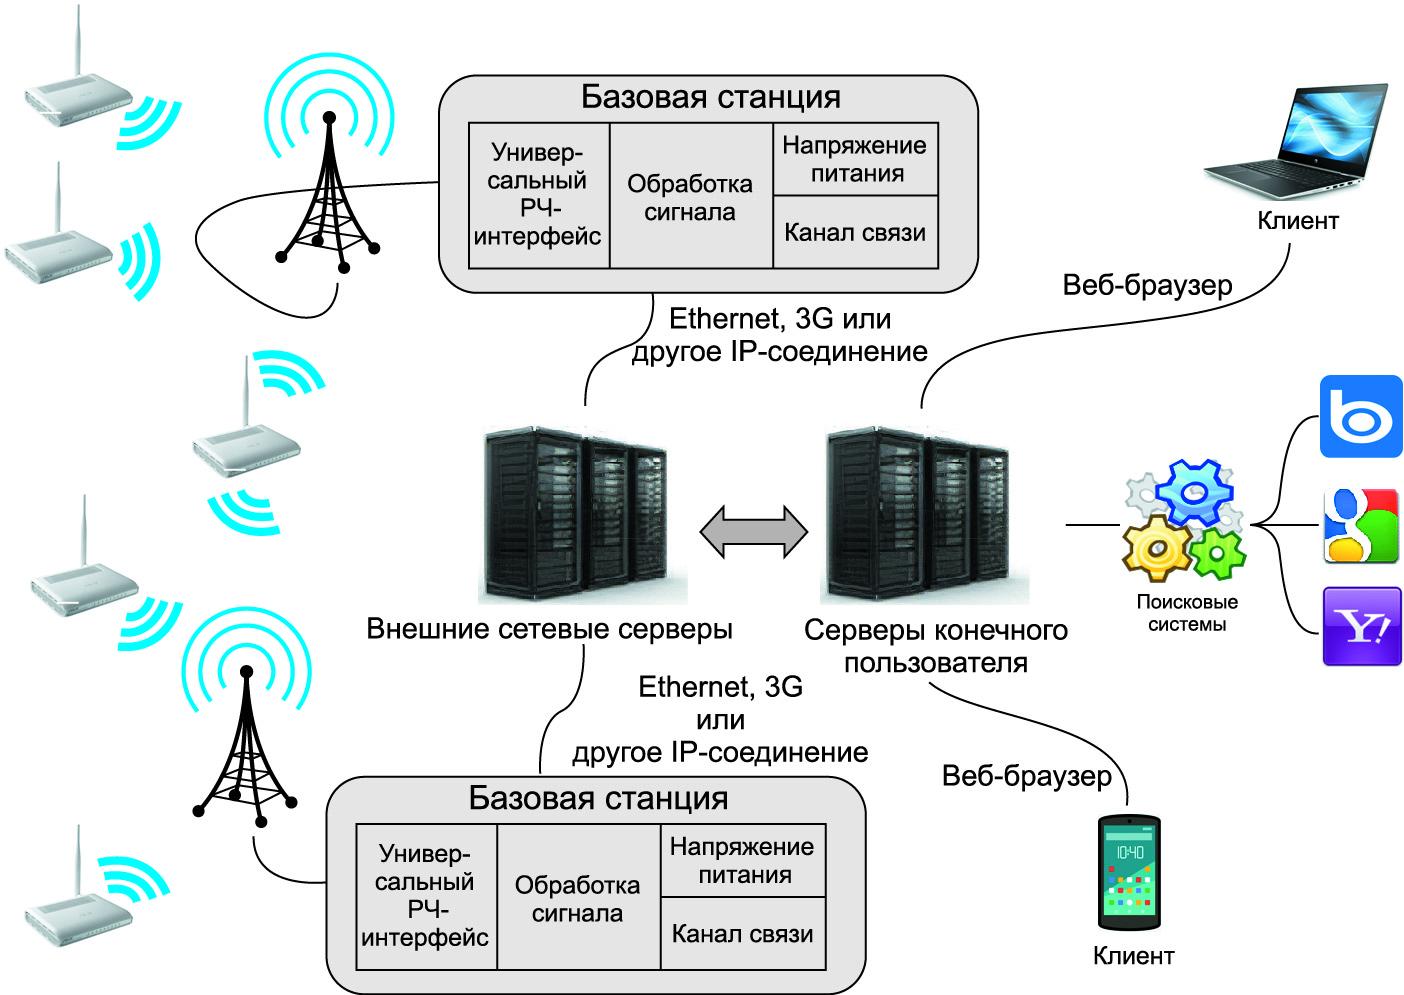 Структура сети SIGFOX [24]